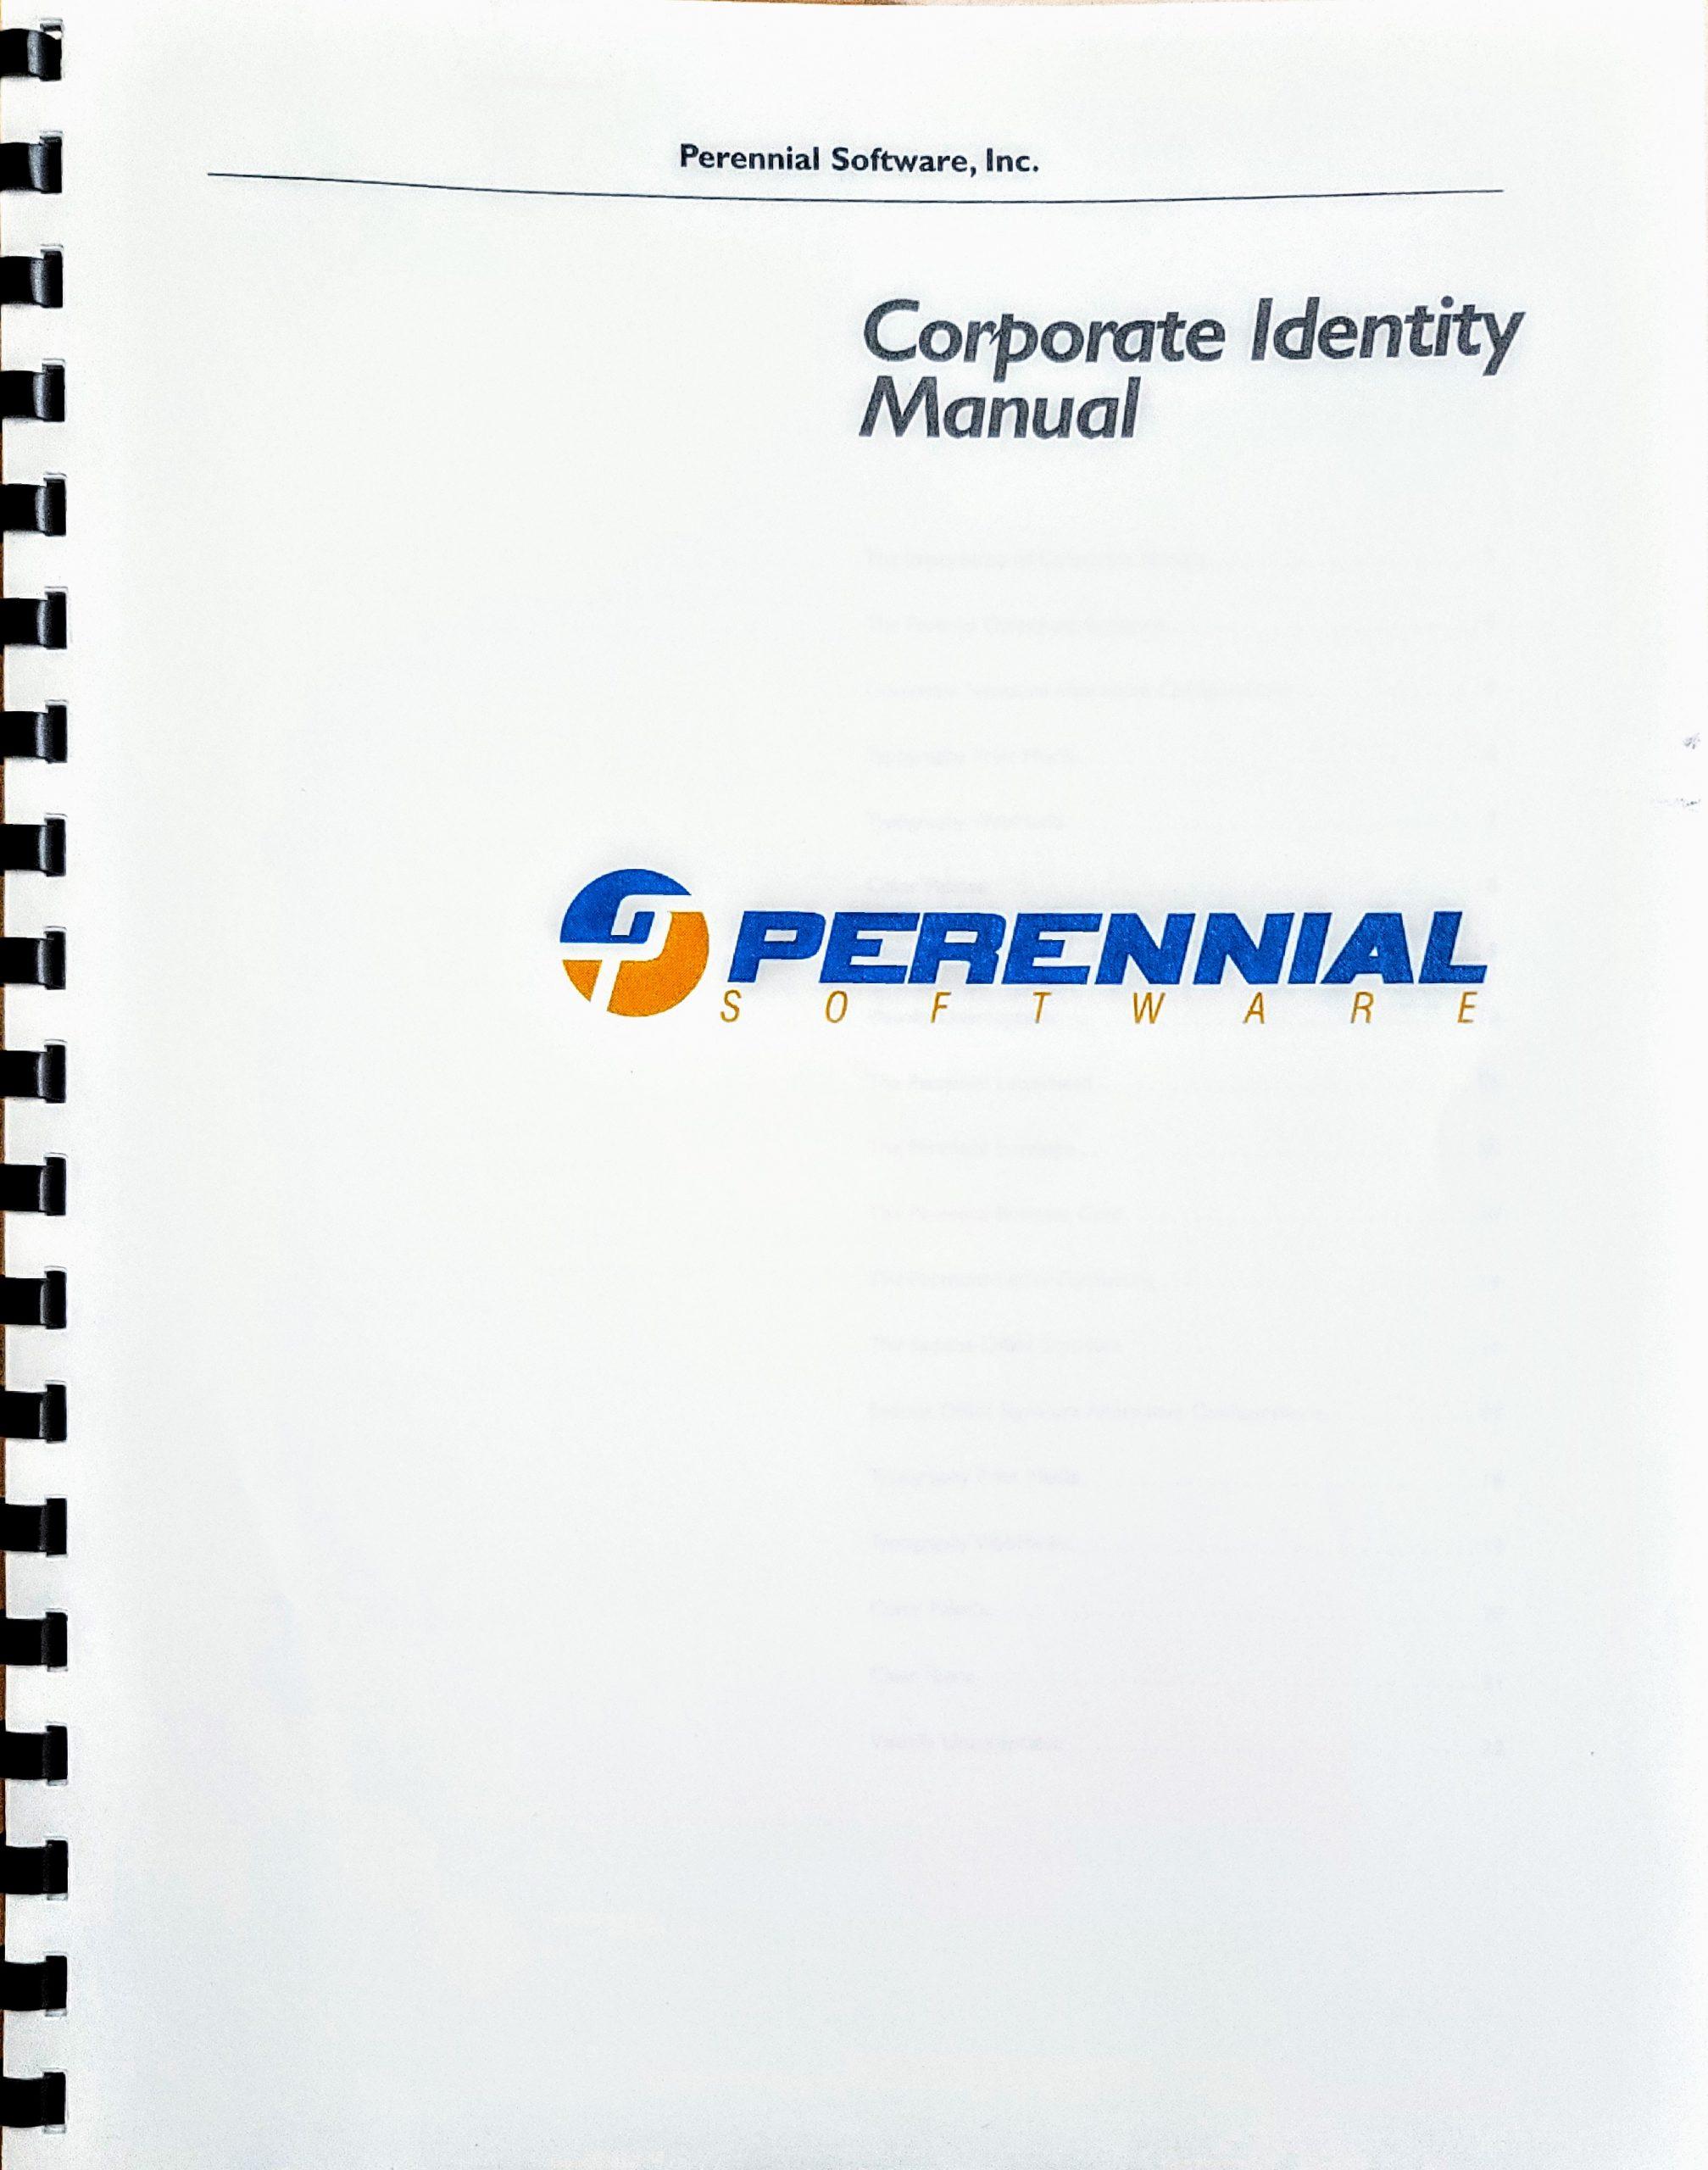 perennial_corp id_2